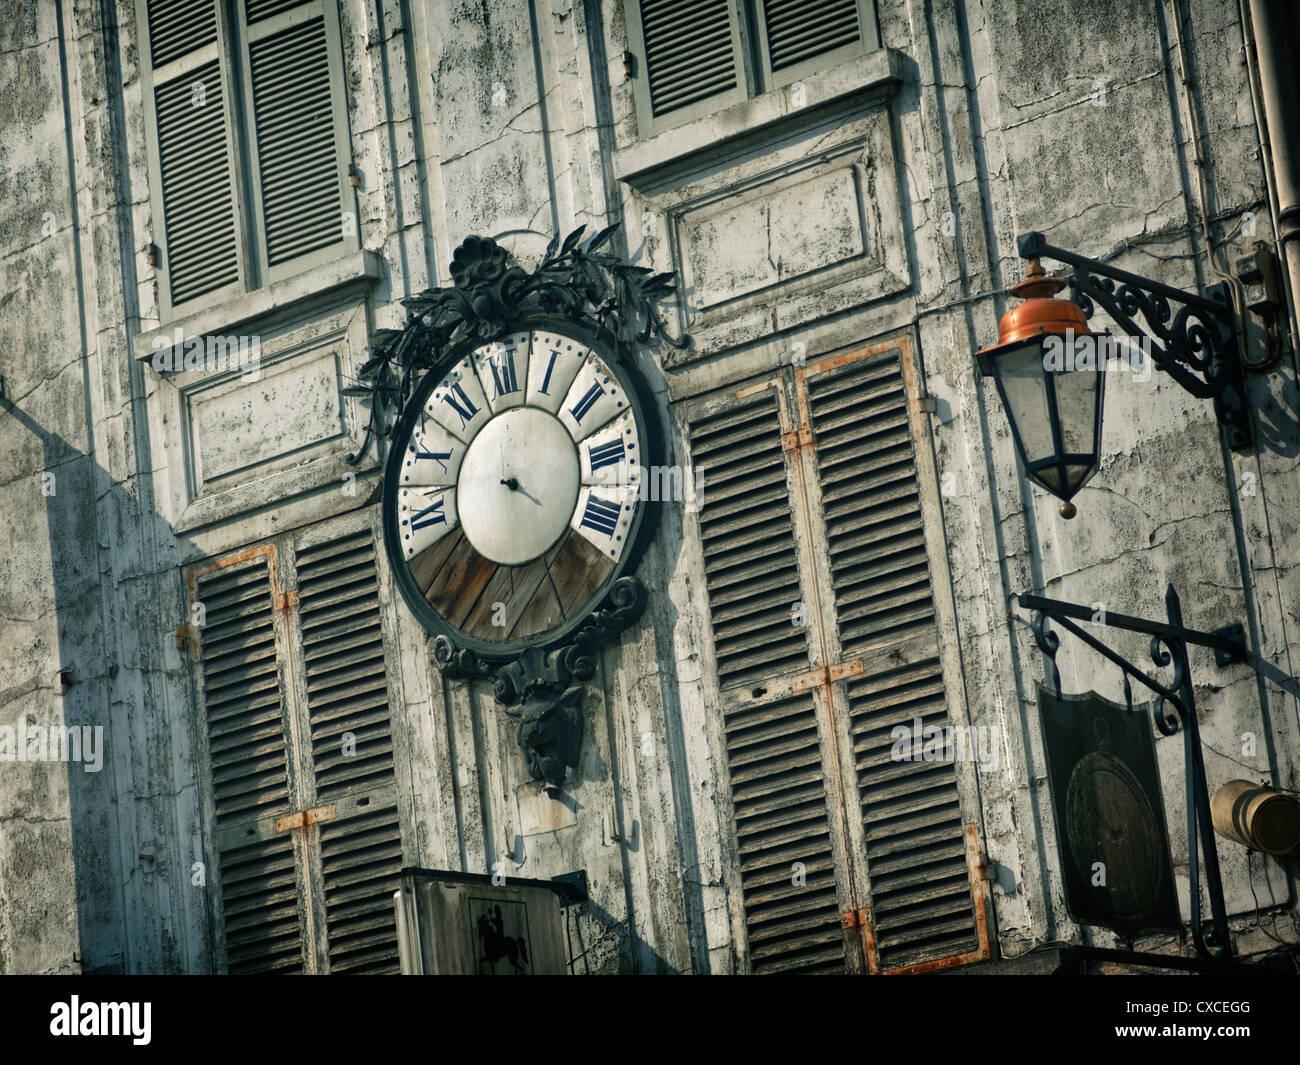 Broken clock in a village near Paris, France - Stock Image